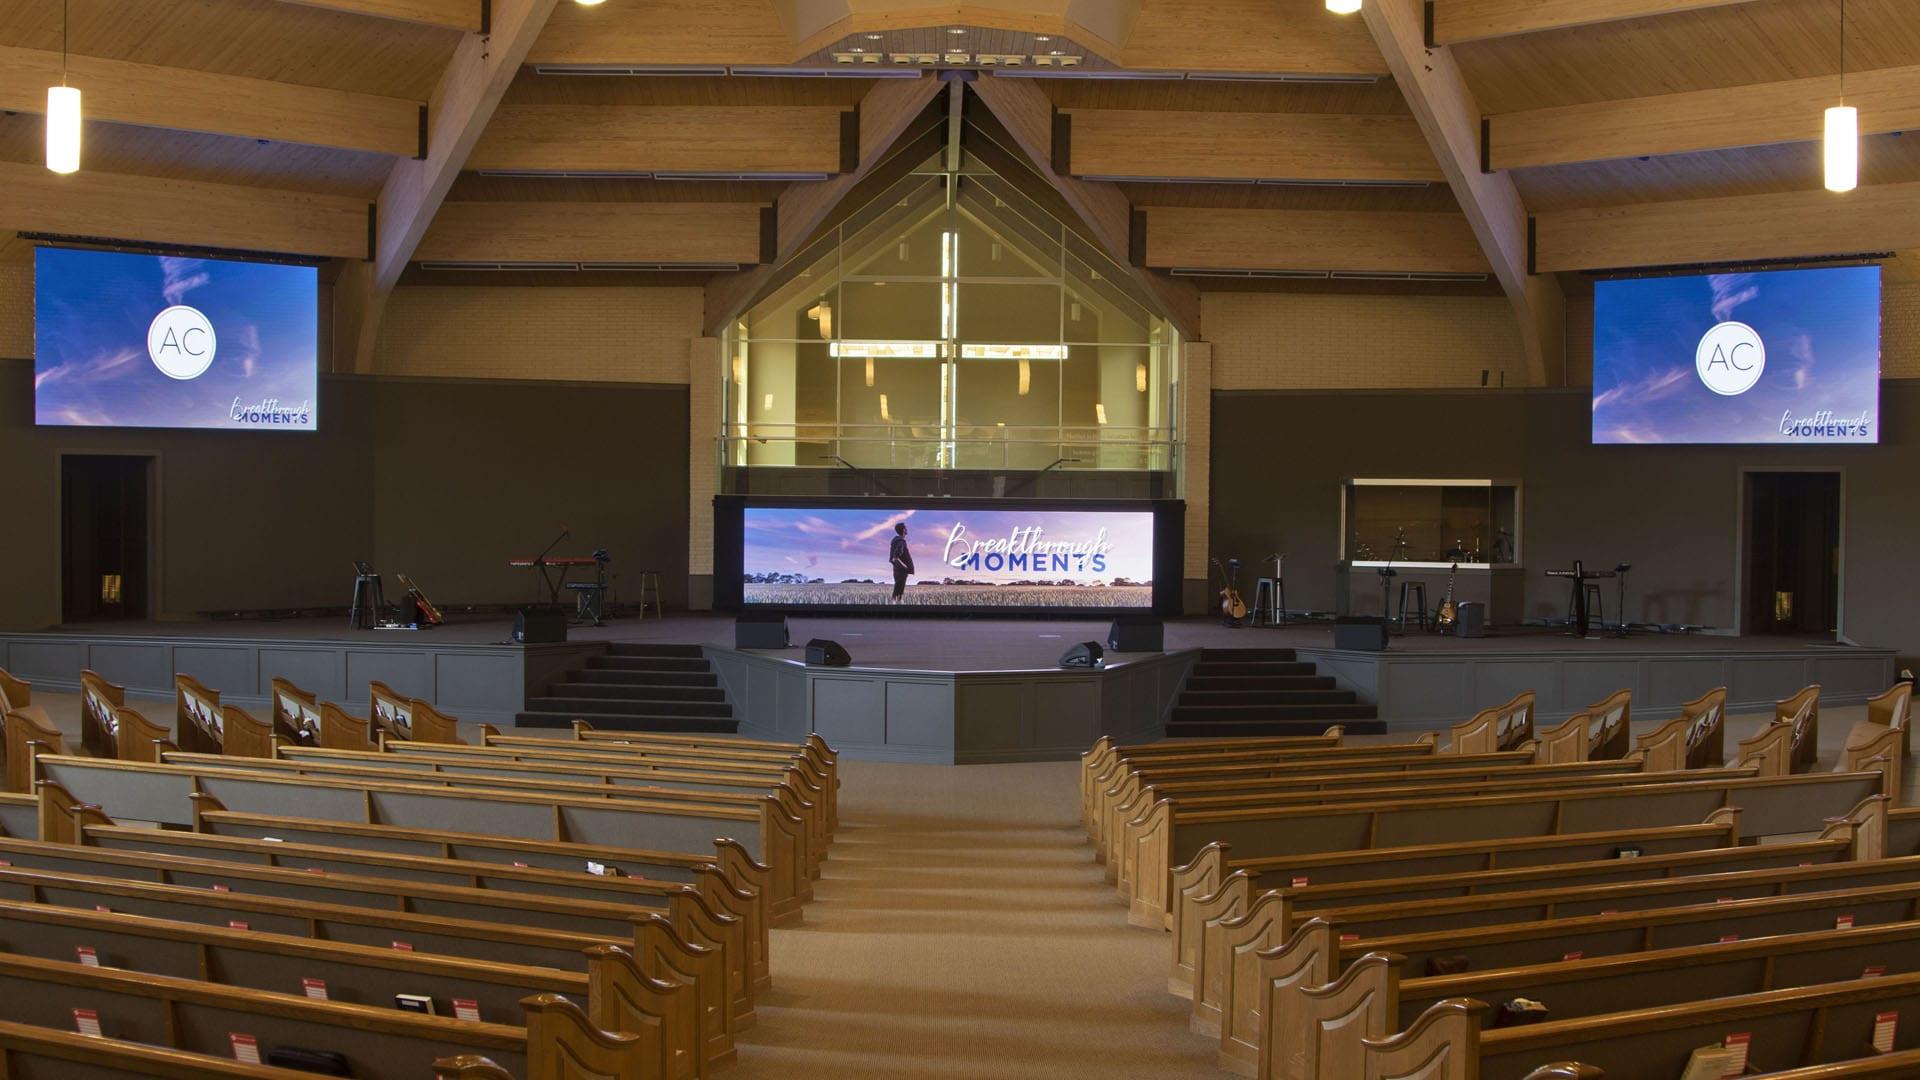 Neoti LED Video walls at Apostolic Church in Barberton Ohio